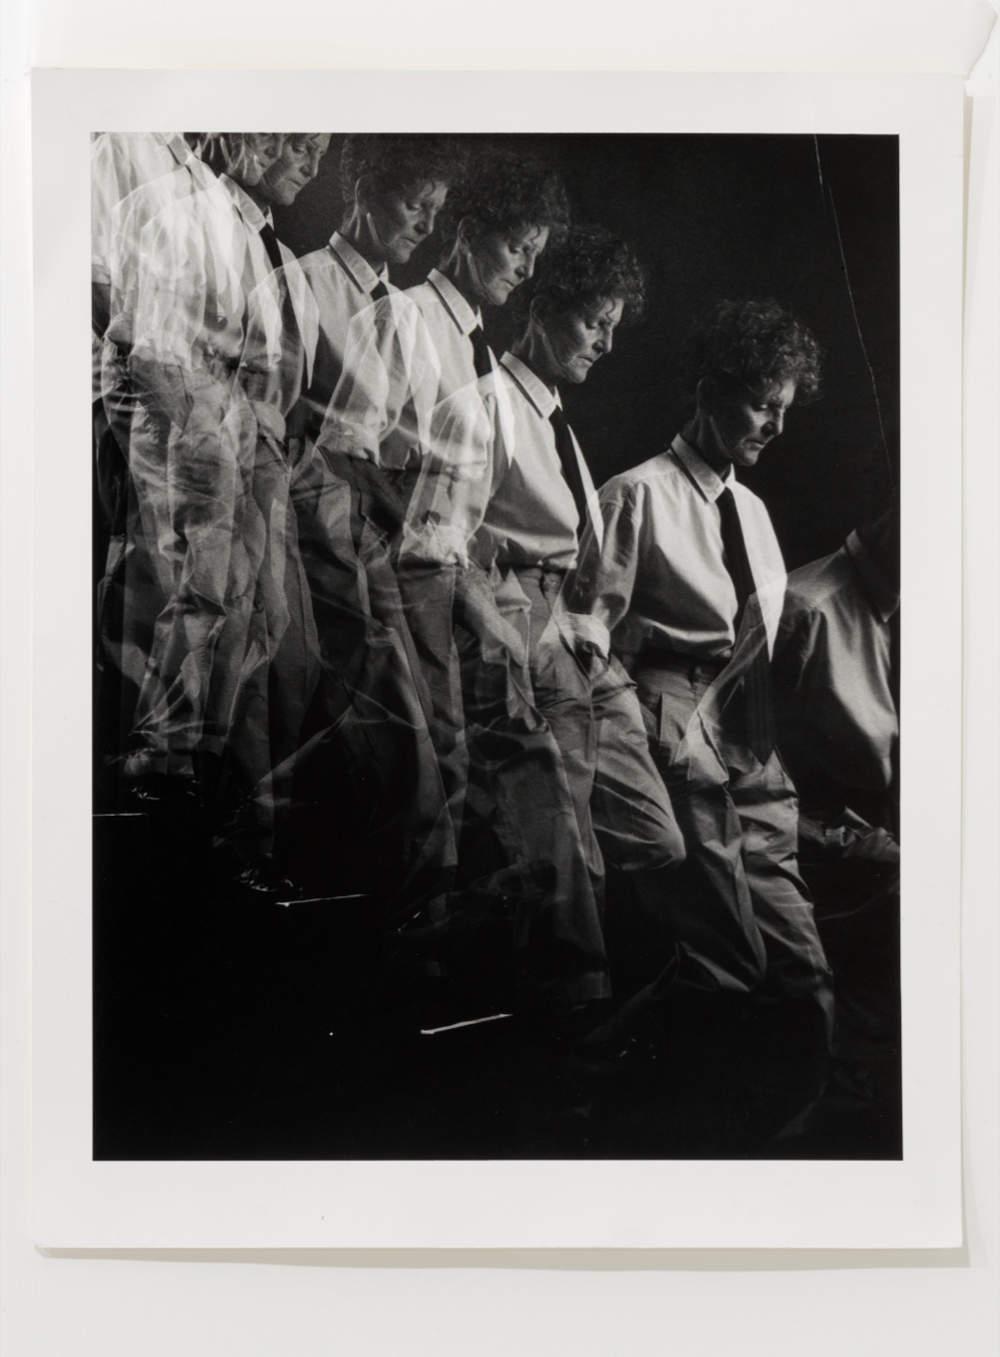 Sturtevant, Duchamp Marcel Duchamp. Black and White Photograph, hand print 35 x 27,9 cm (13,78 x 10,98 in) 20,8 x 24,3 cm (8,19 x 9,57 in) 43,5 x 37,5 cm (17,13 x 14,76 in)